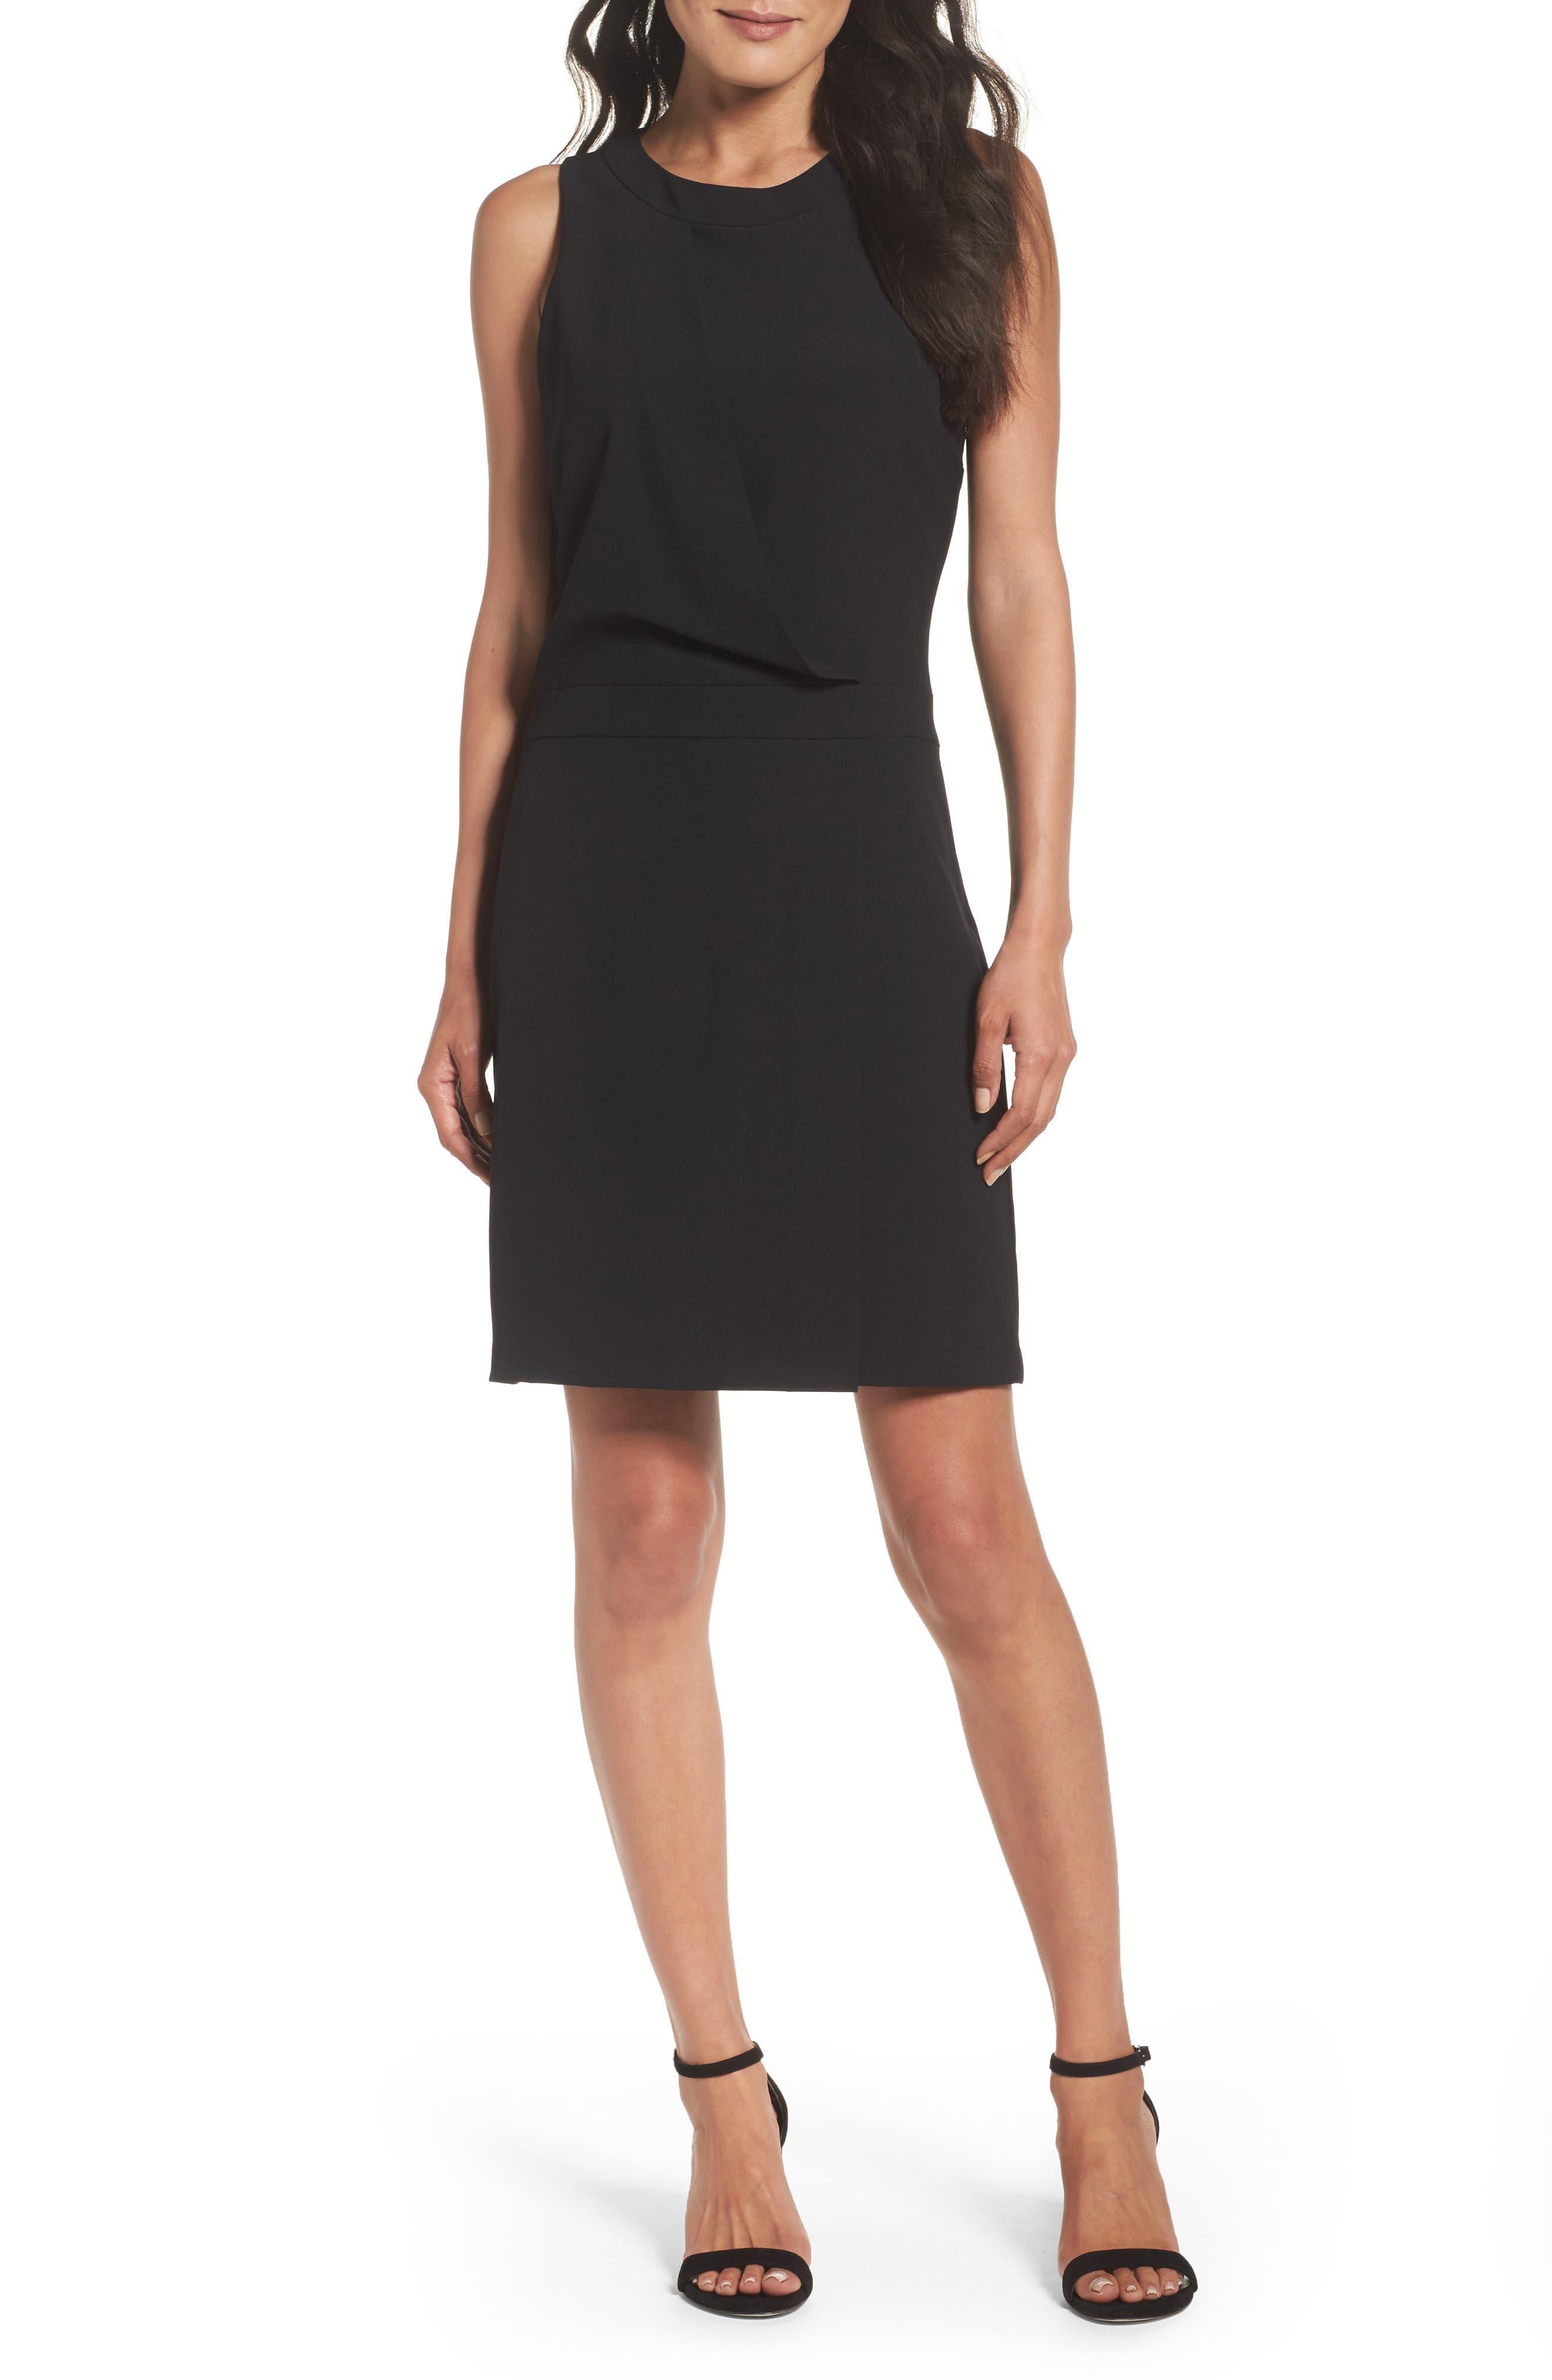 Alternate Image 1 Selected - Julia Jordan Stretch Sheath Dress